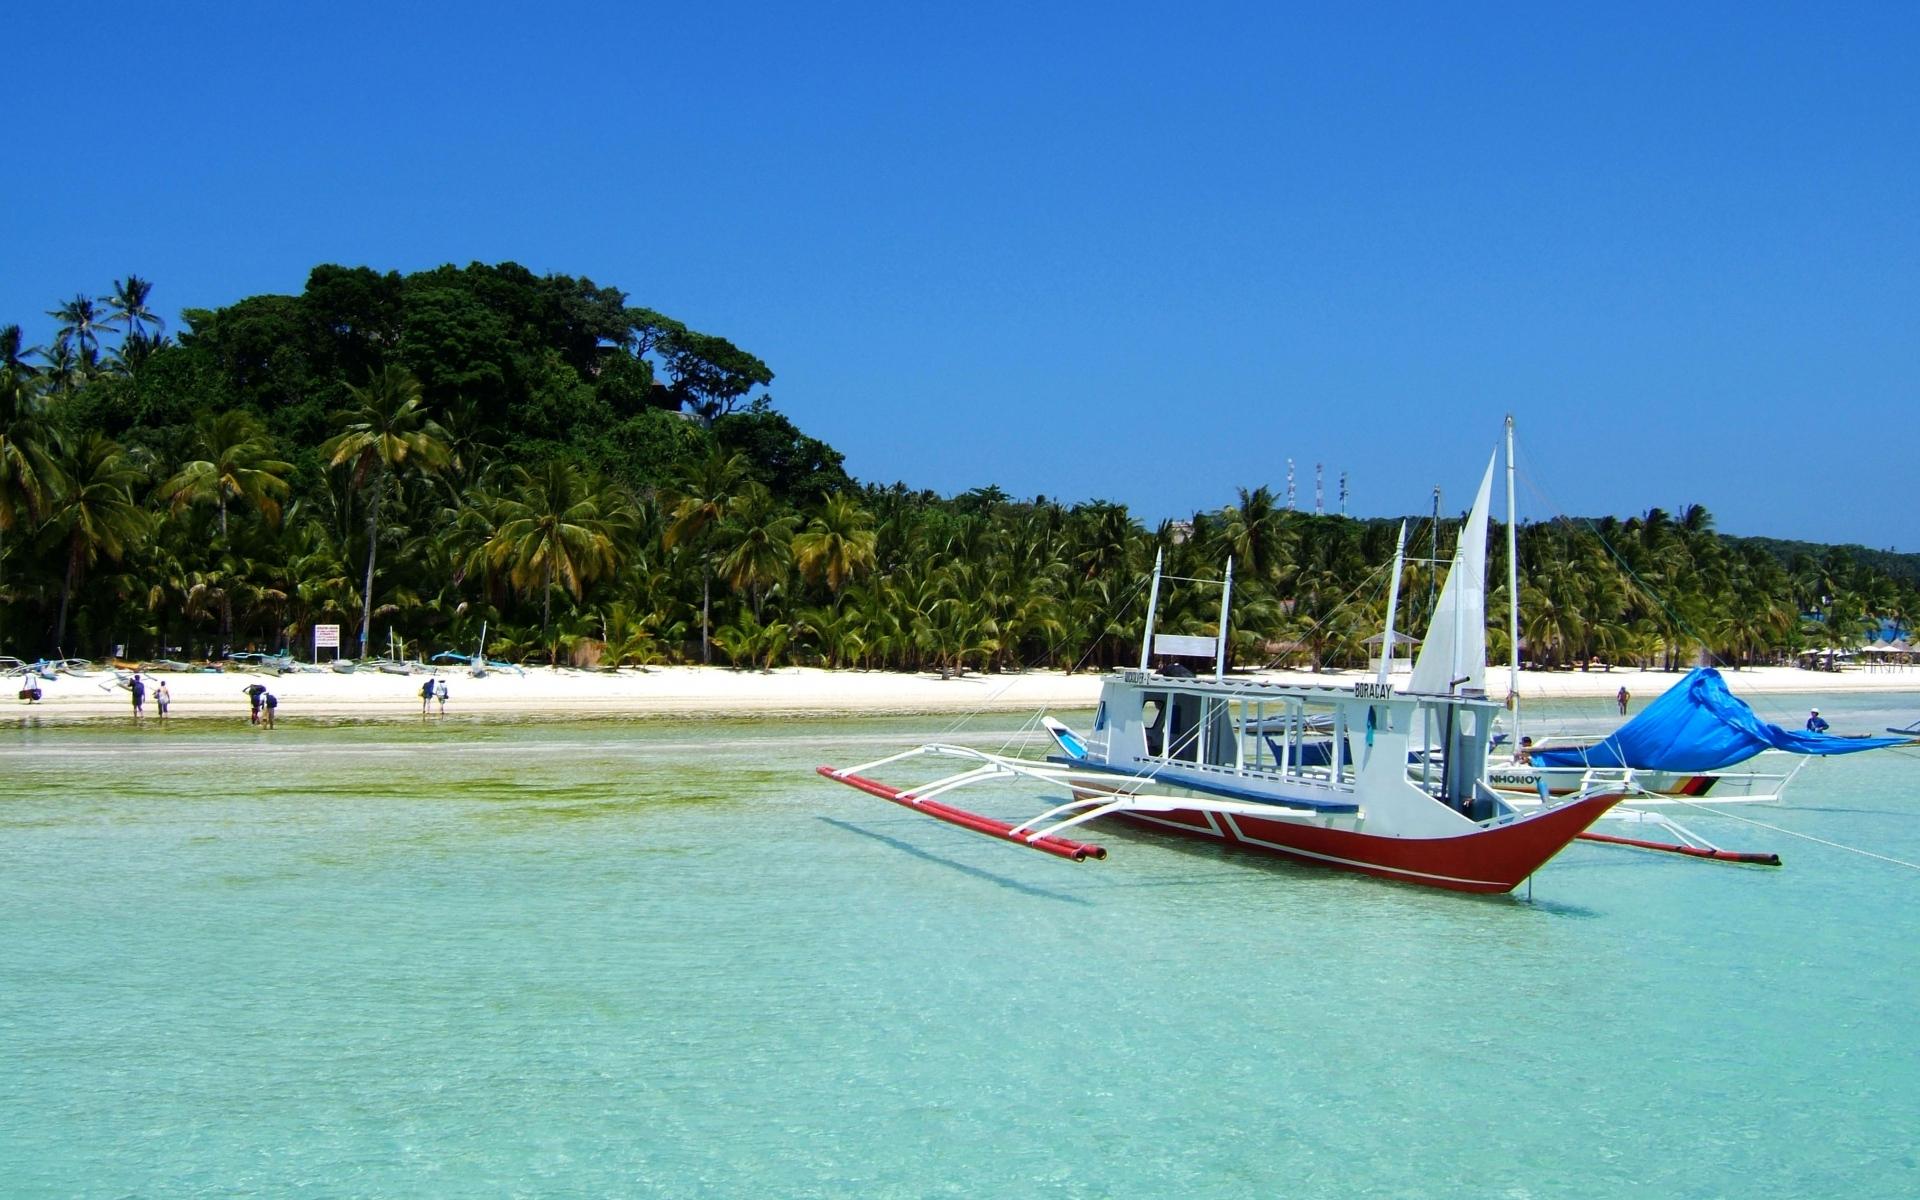 Картинки тропики, пляж, лодка, небо фото и обои на рабочий стол